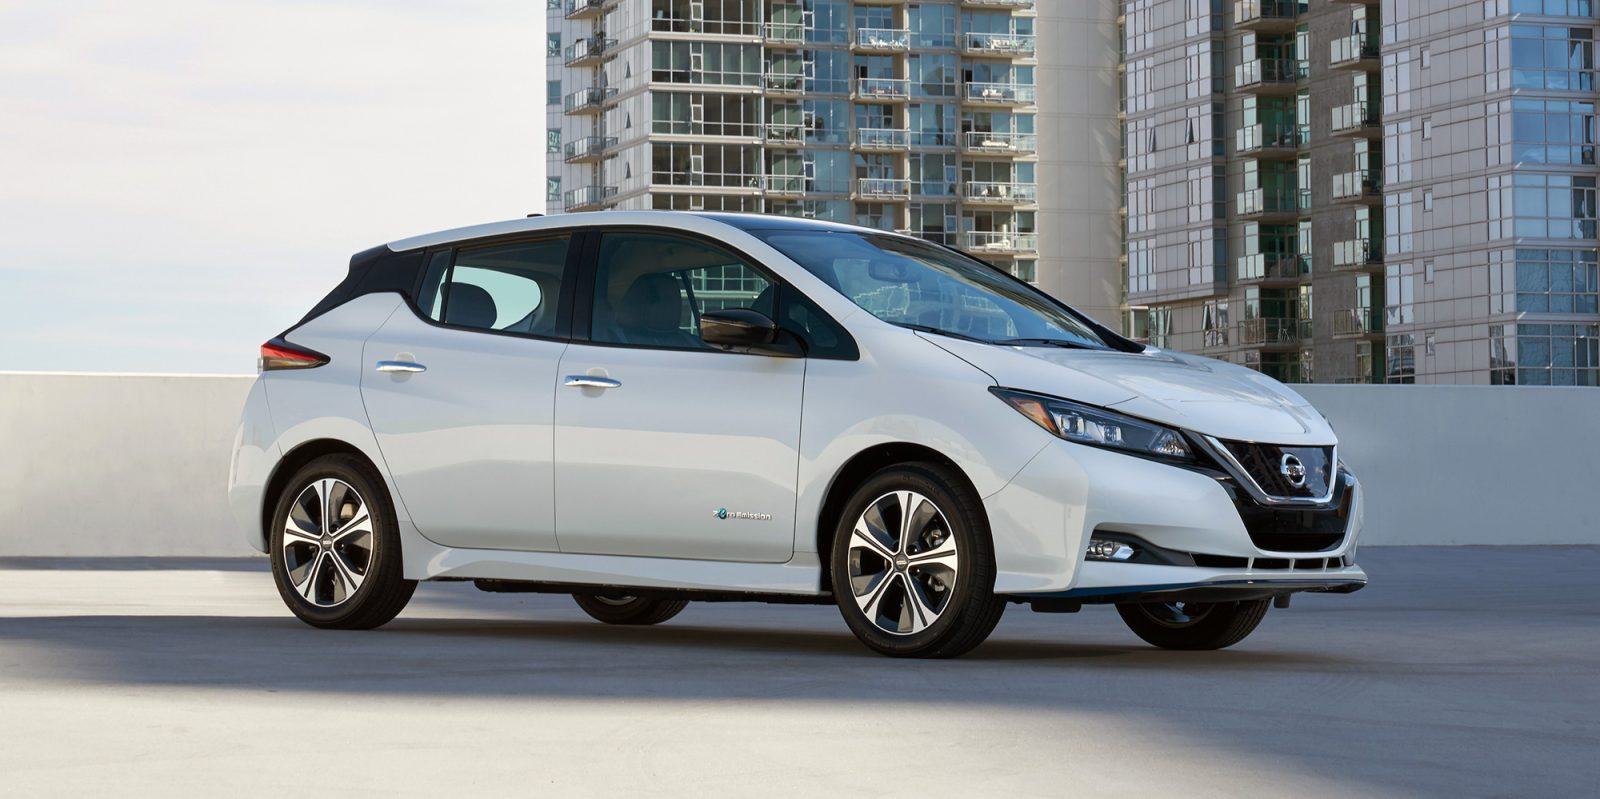 Nissan Leaf: Price, Reviews, Features, etc - Electrek